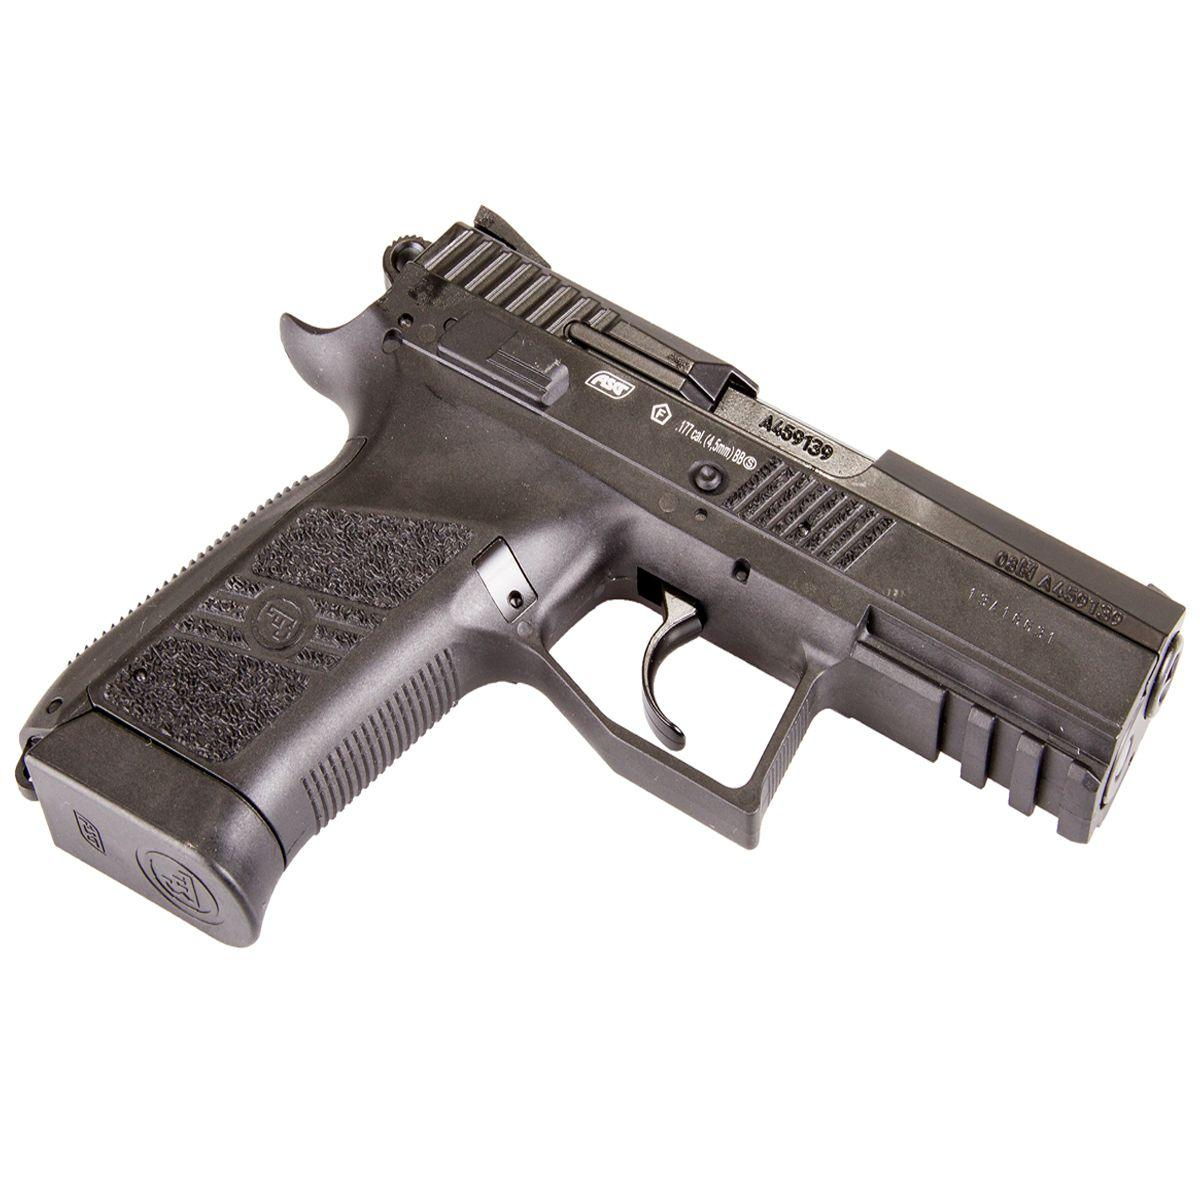 Buy cheap cz 16718 p 07 duty blowback airsoft replicaairguns ca